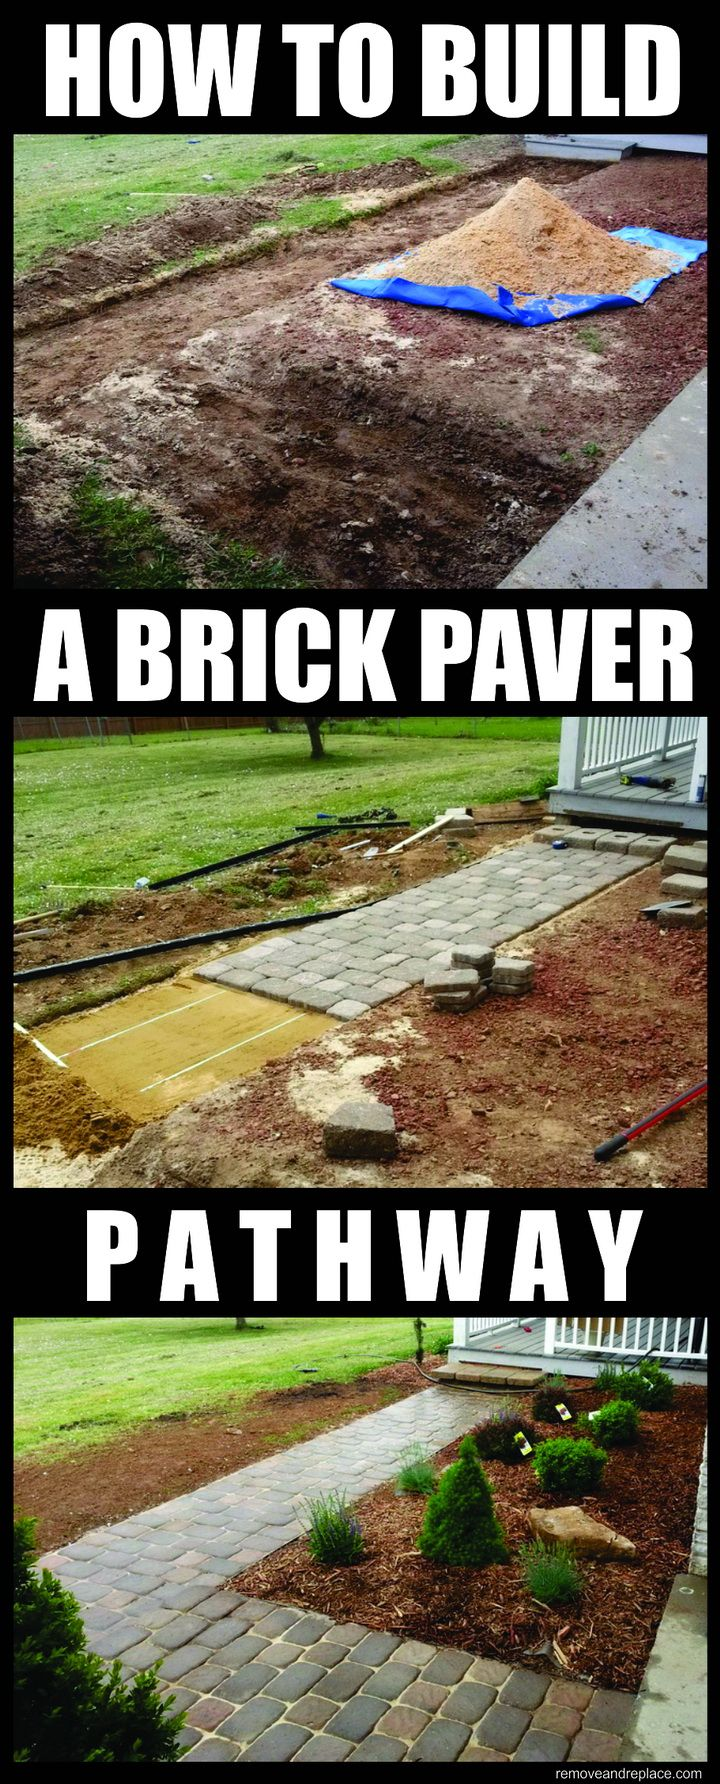 How To Build A Pavestone Home Entranceway Walkway With Brick Pavers Diy Outdoor Backyard Paver Walkway